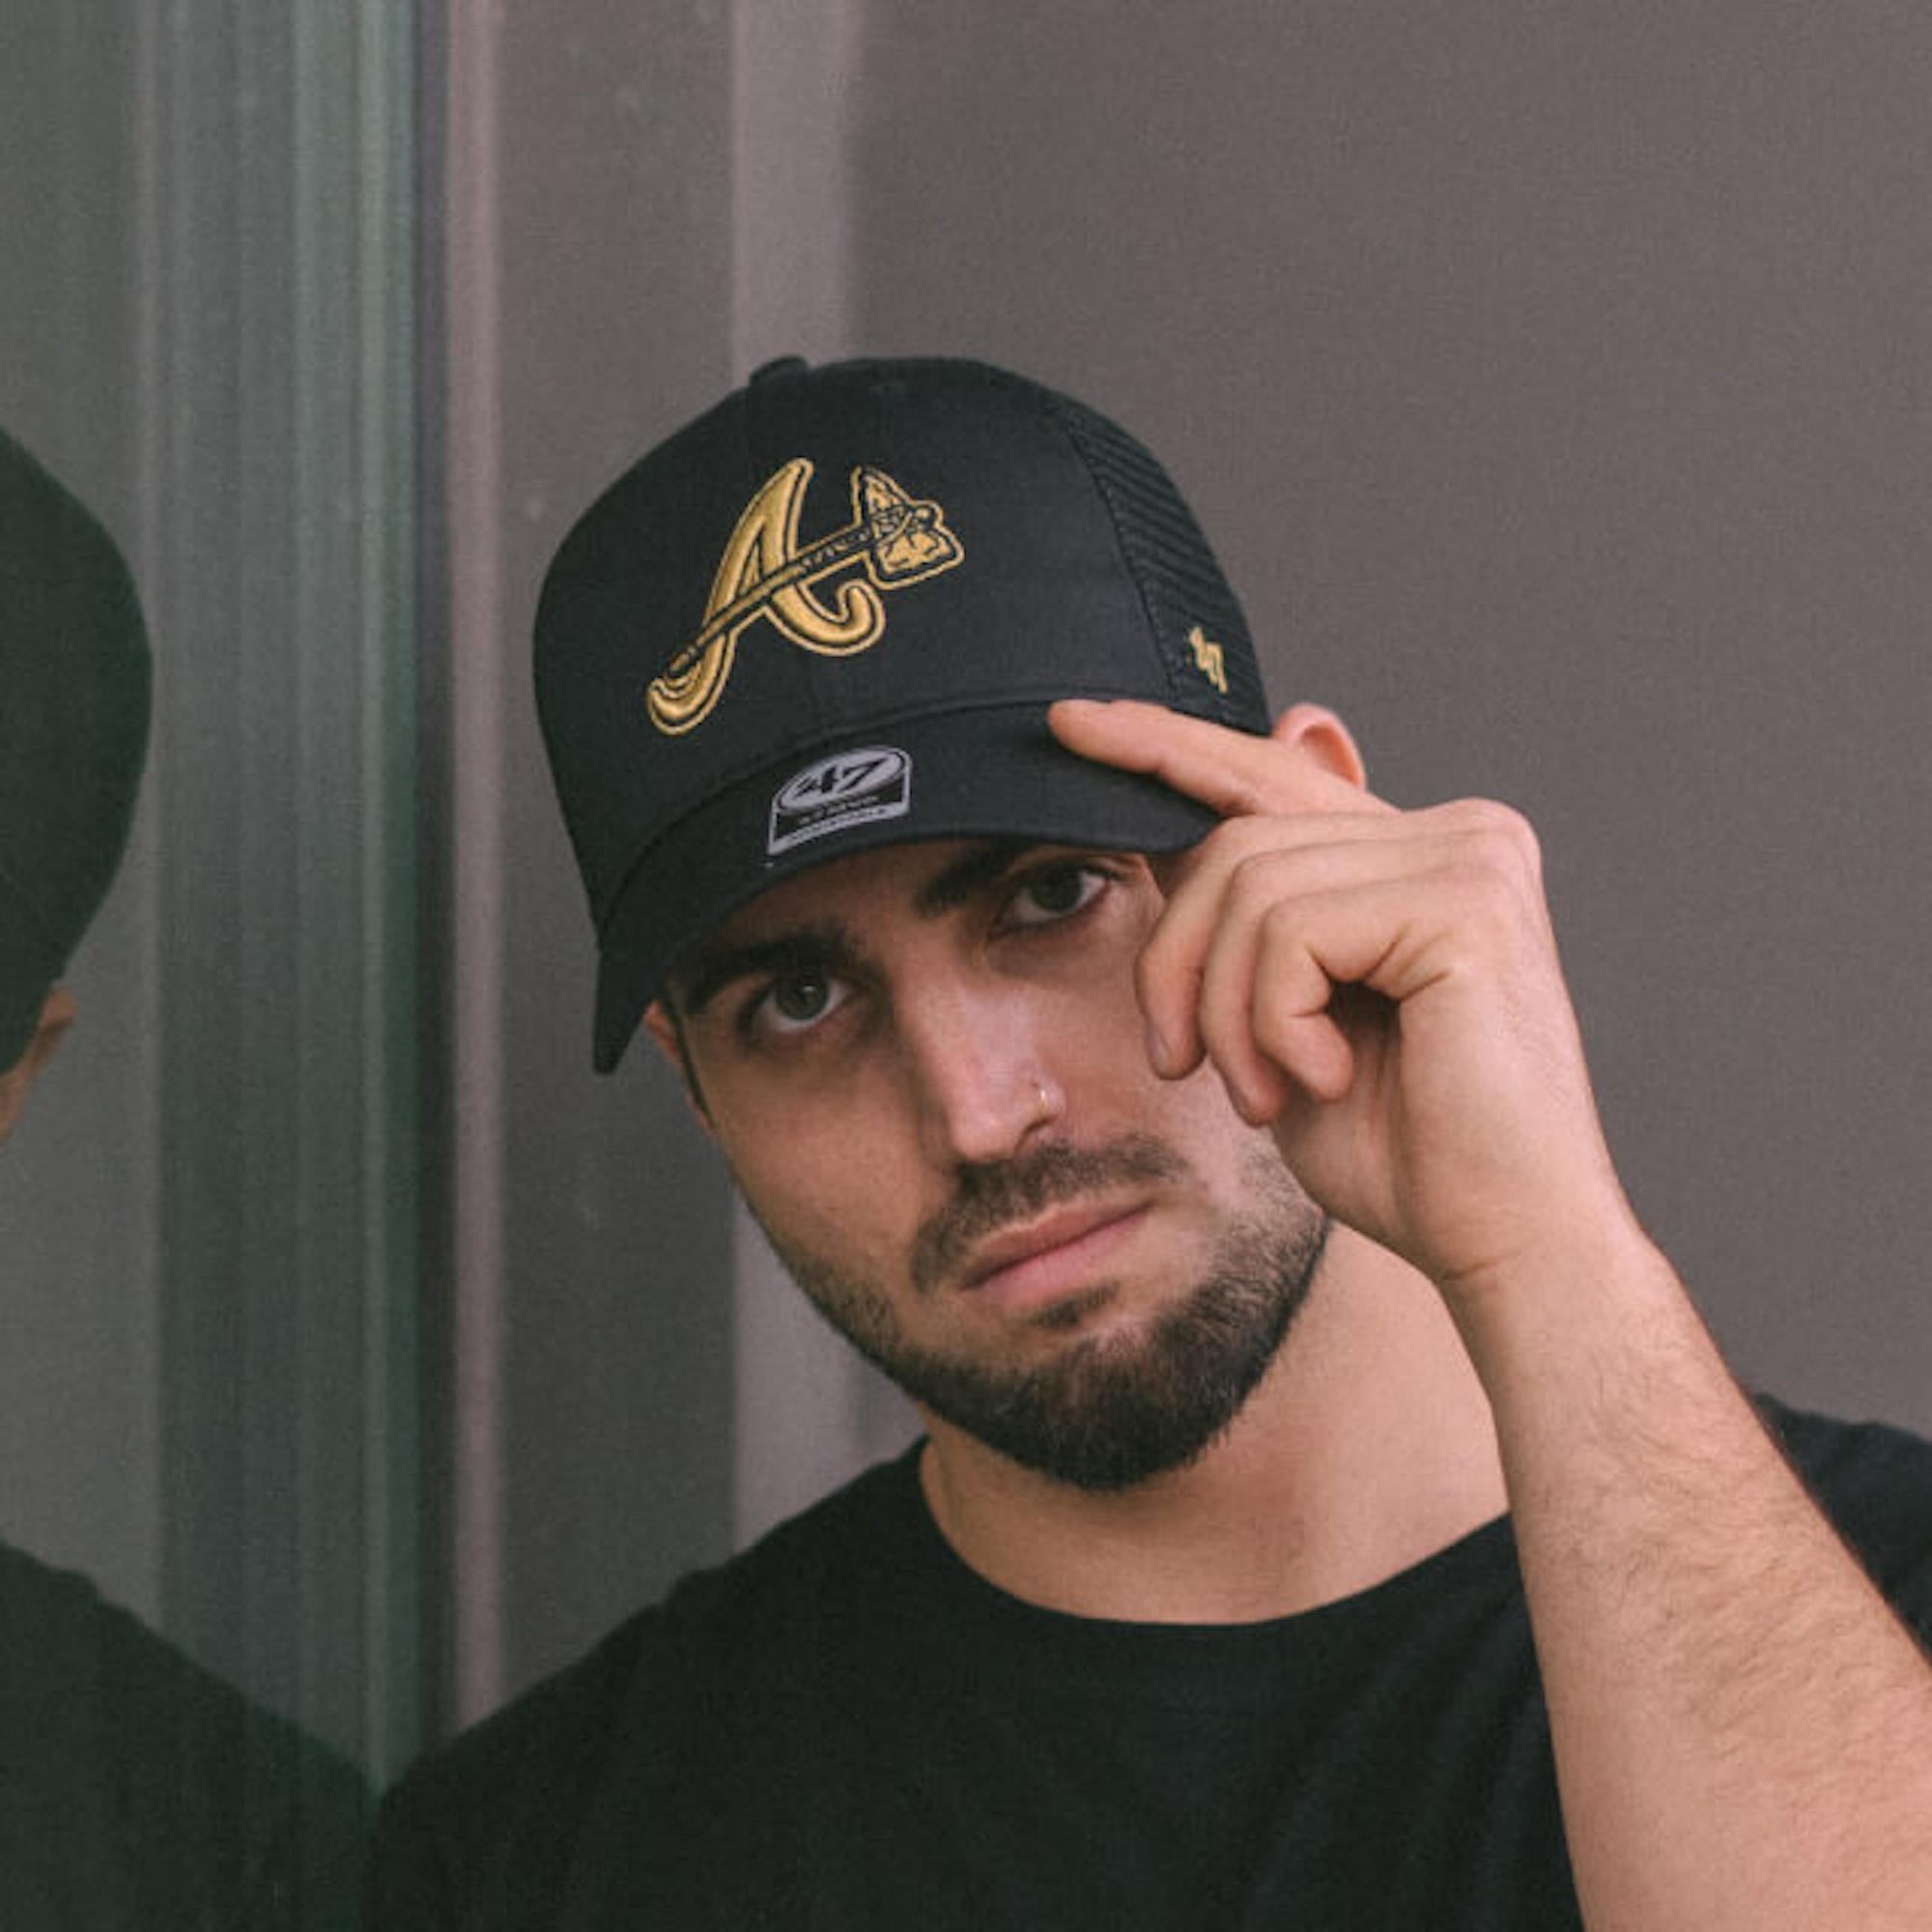 Hatstore x '47 MLB Fall 2020